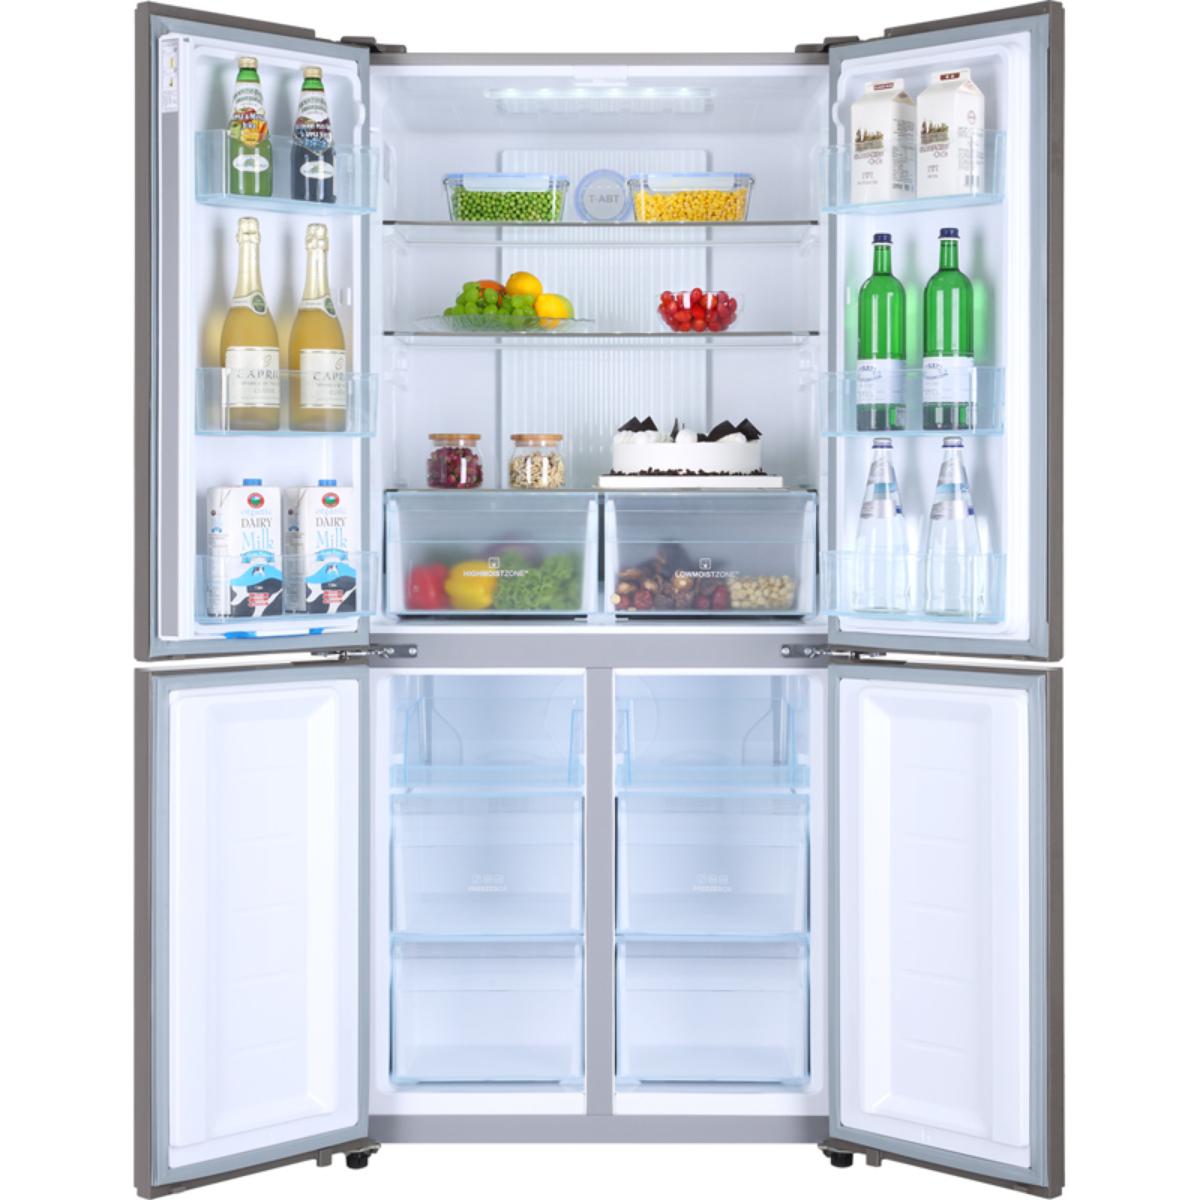 海尔冰箱BCD-480WDGB